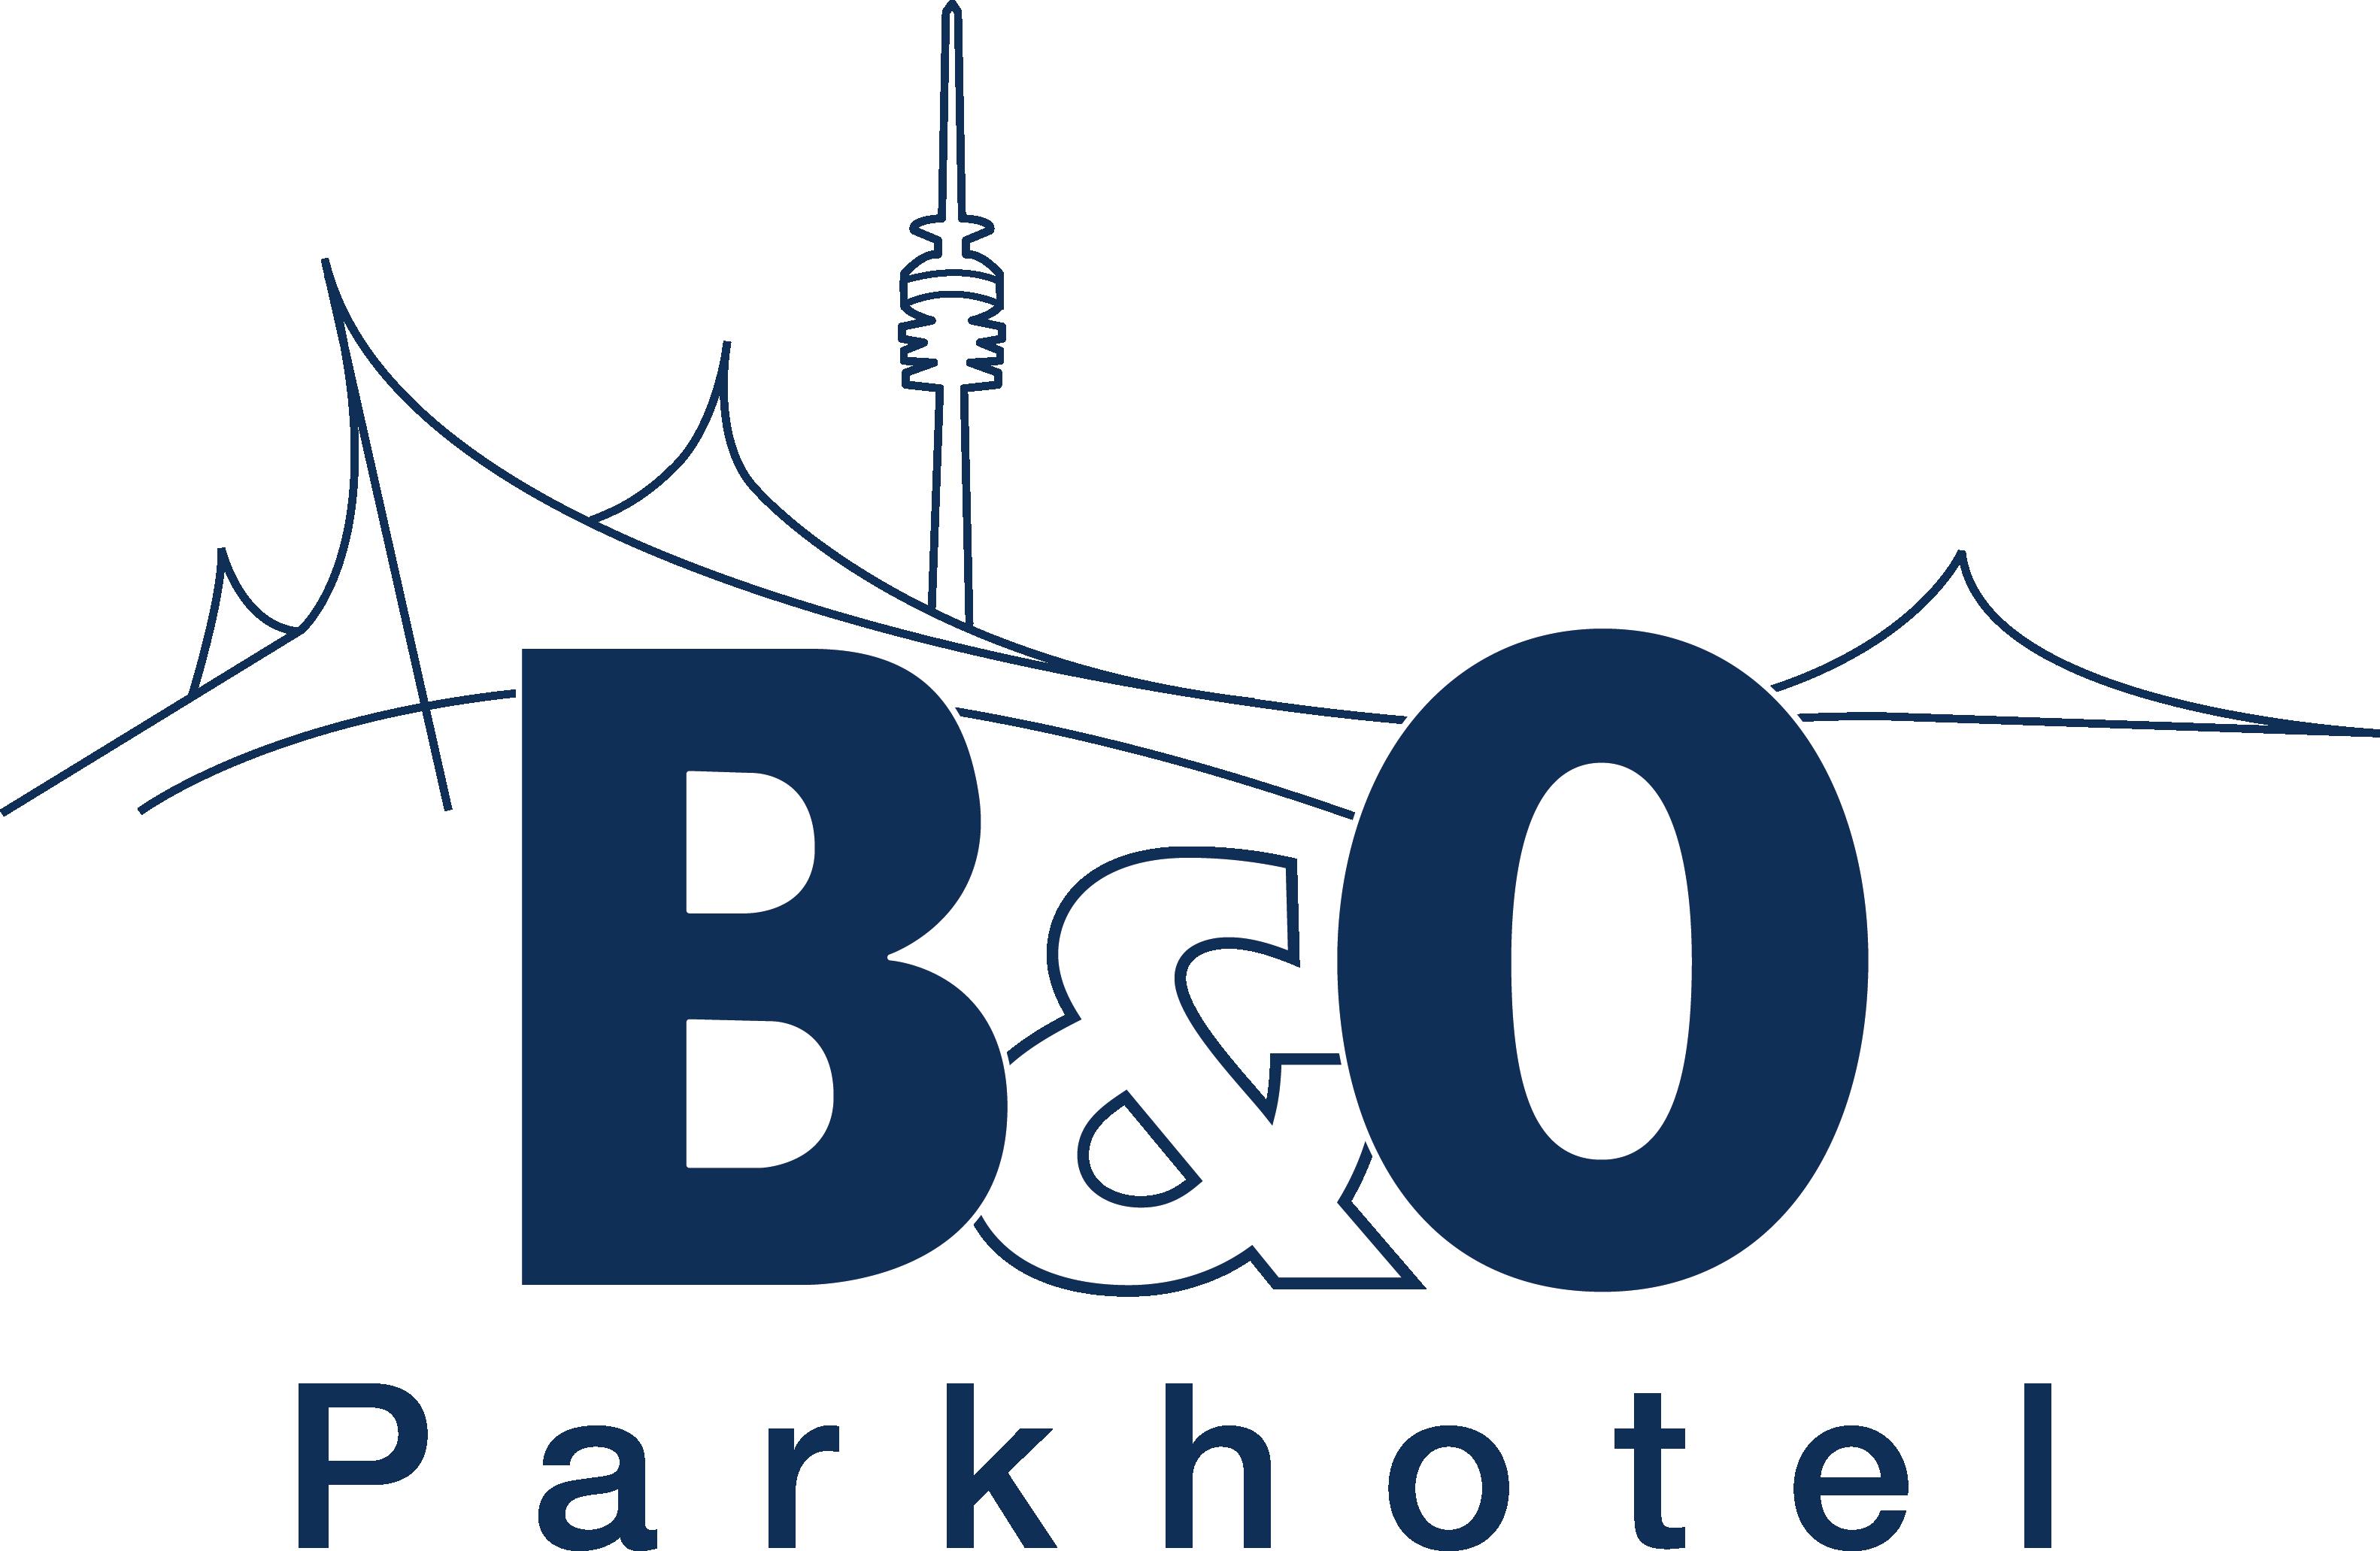 B&O Parkhotel